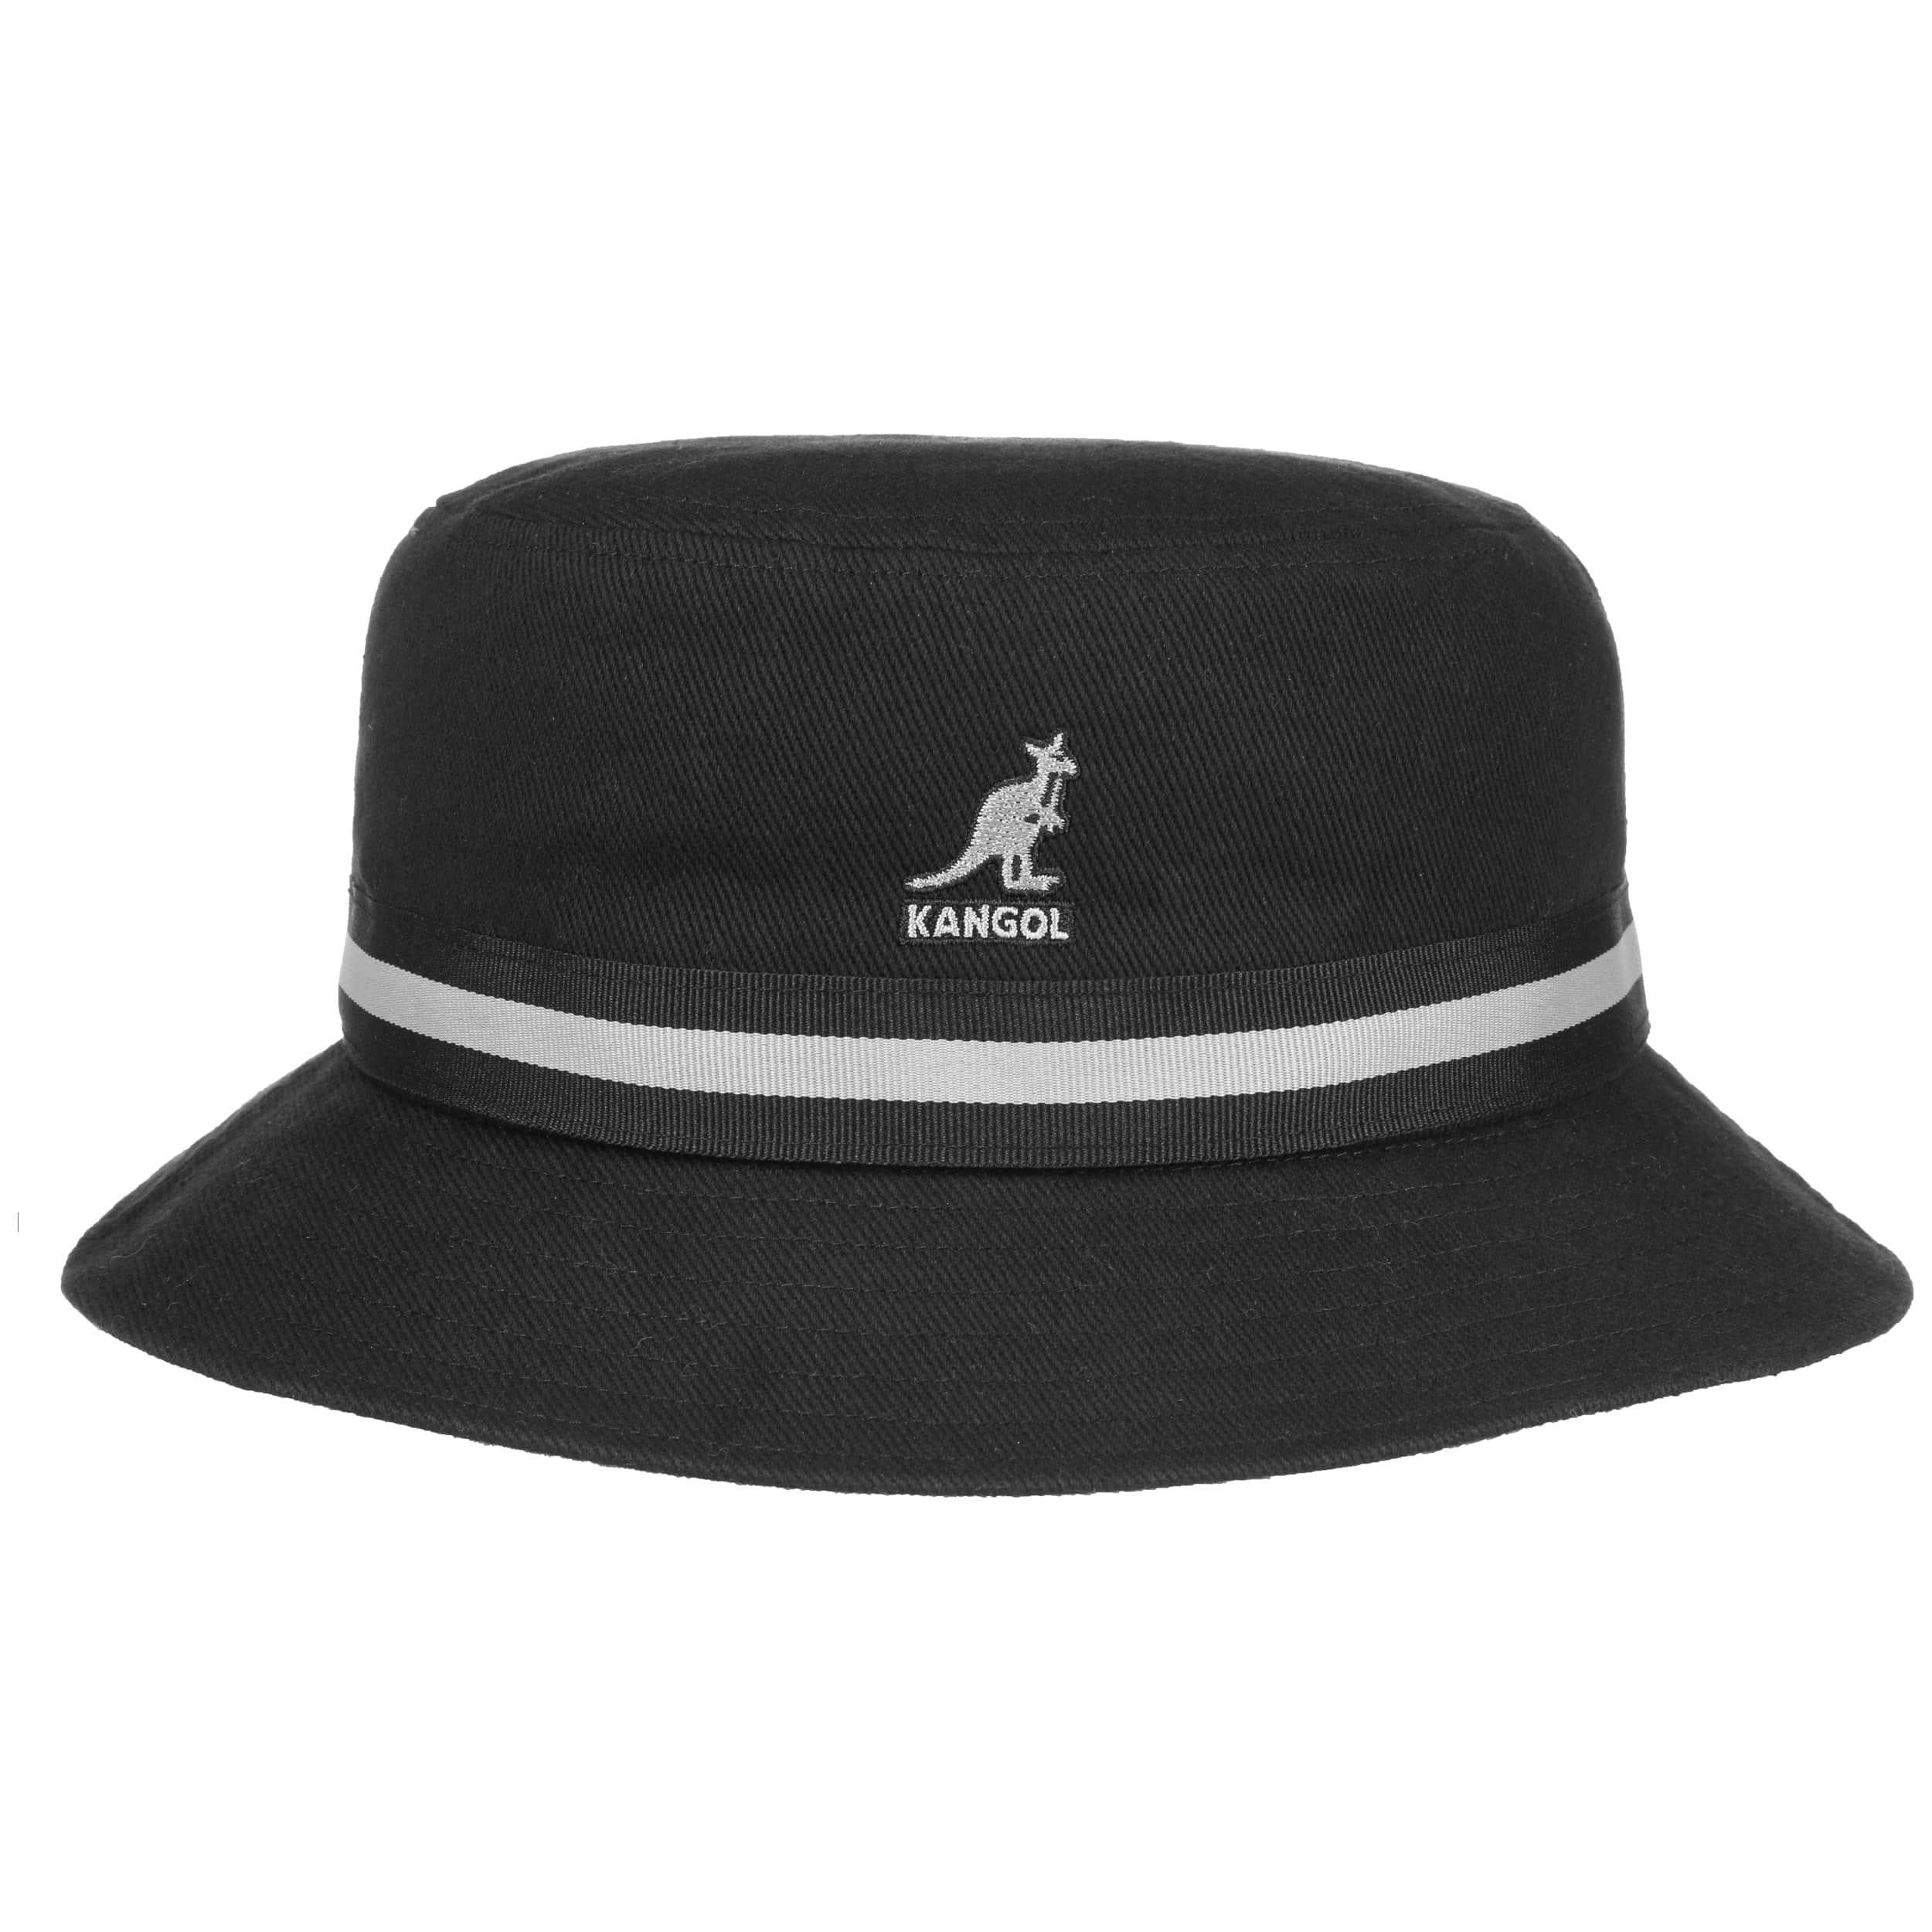 e19bf50d0bb249 ... hat by kangol black 4 9074a d5ac0 switzerland stripe lahinch cotton hat  by kangol black 4 9074a d5ac0  australia baws dad hat elephant baws char  grey ...